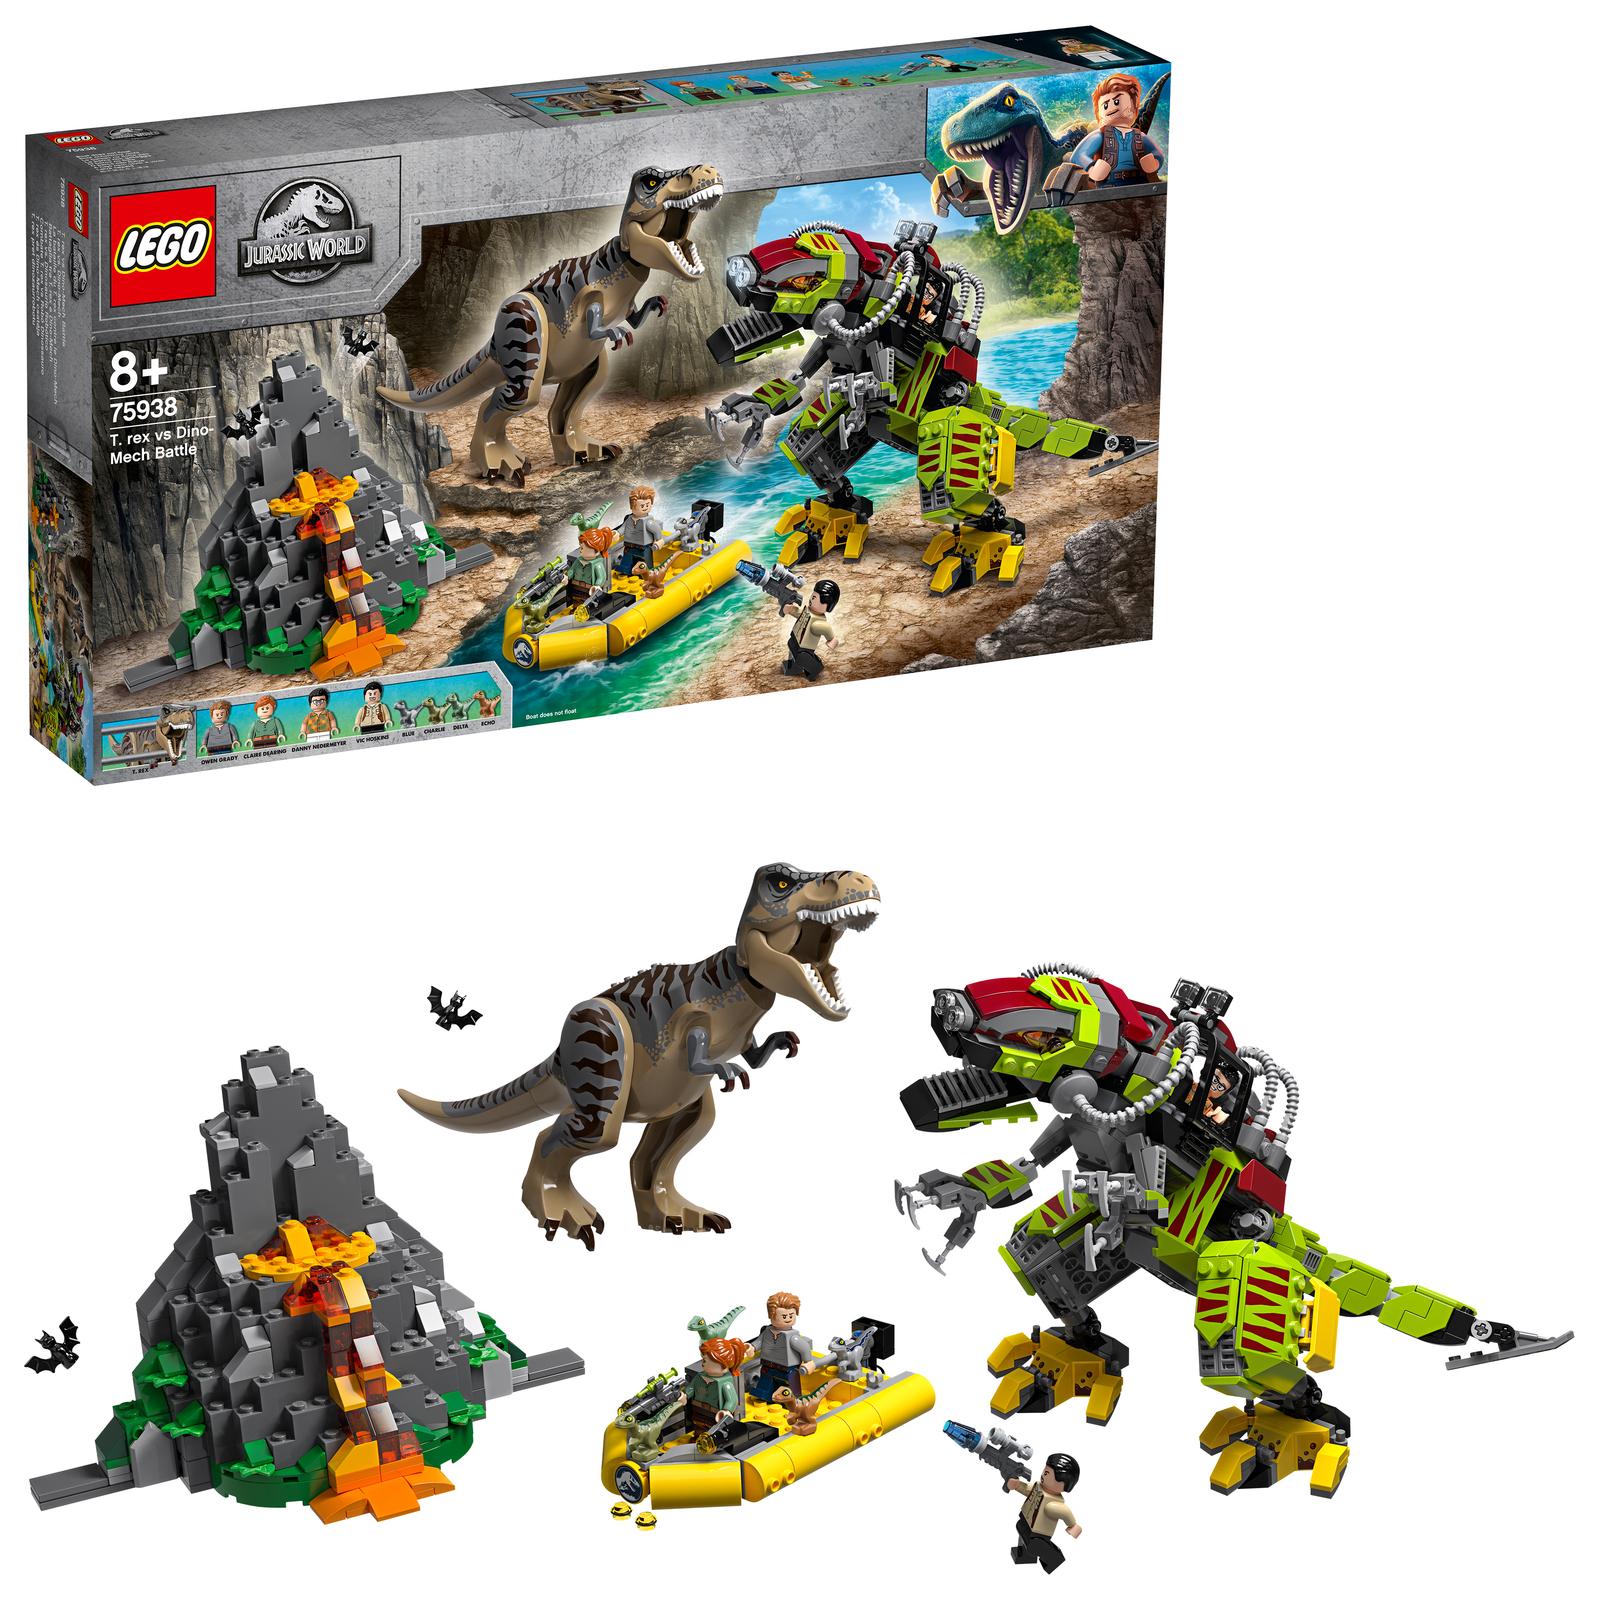 LEGO Jurassic World - T Rex vs Dino-Mech Battle (75938)